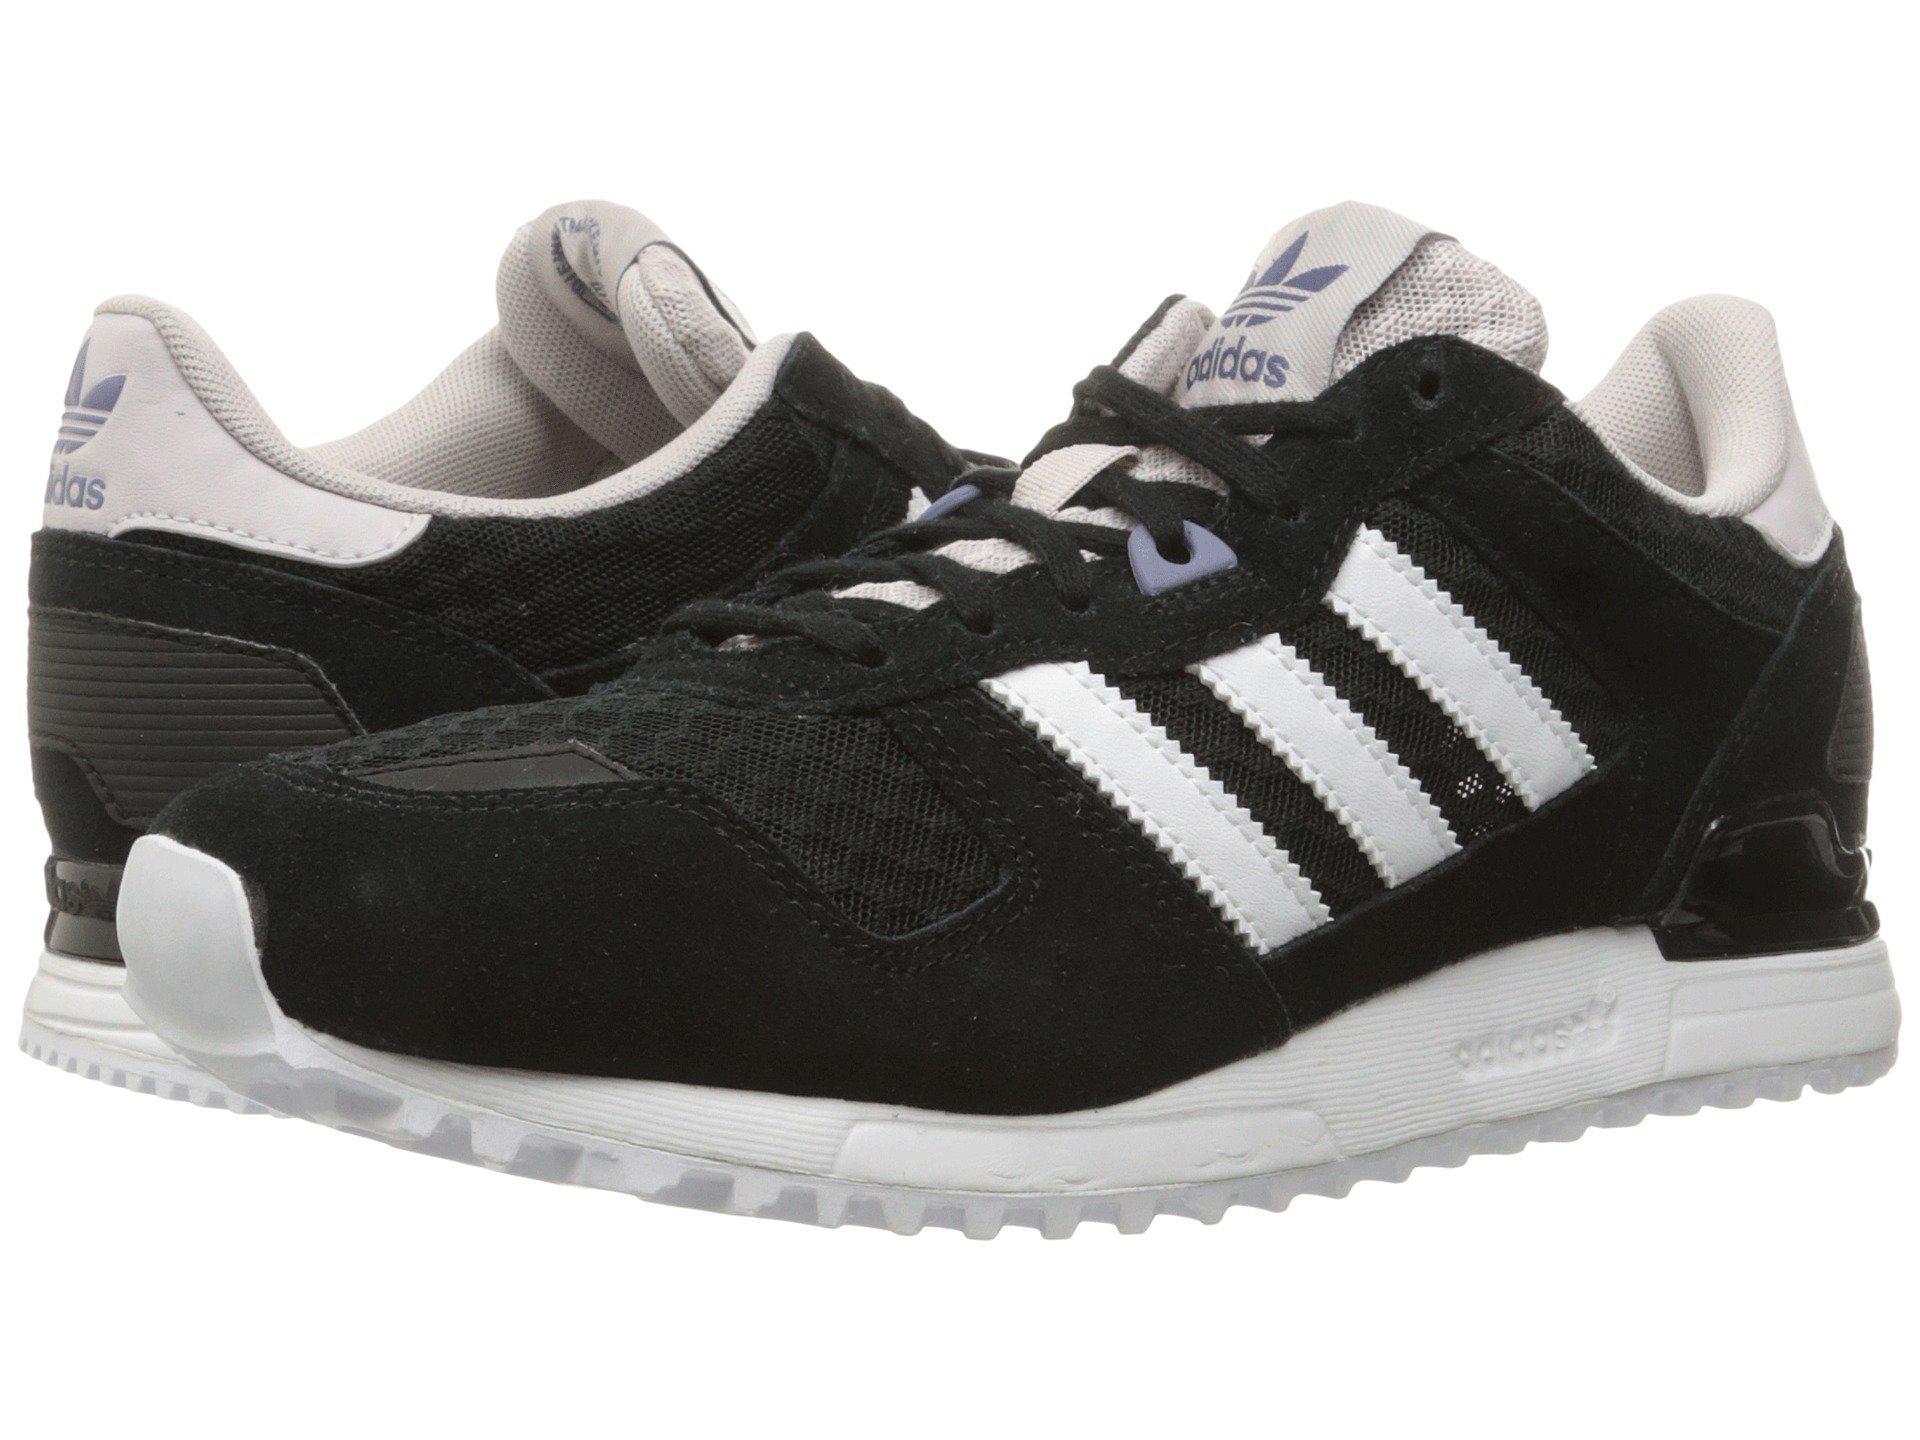 a430f2bb4205 ... netherlands lyst adidas originals zx 700 in black ad34d 7ae5f